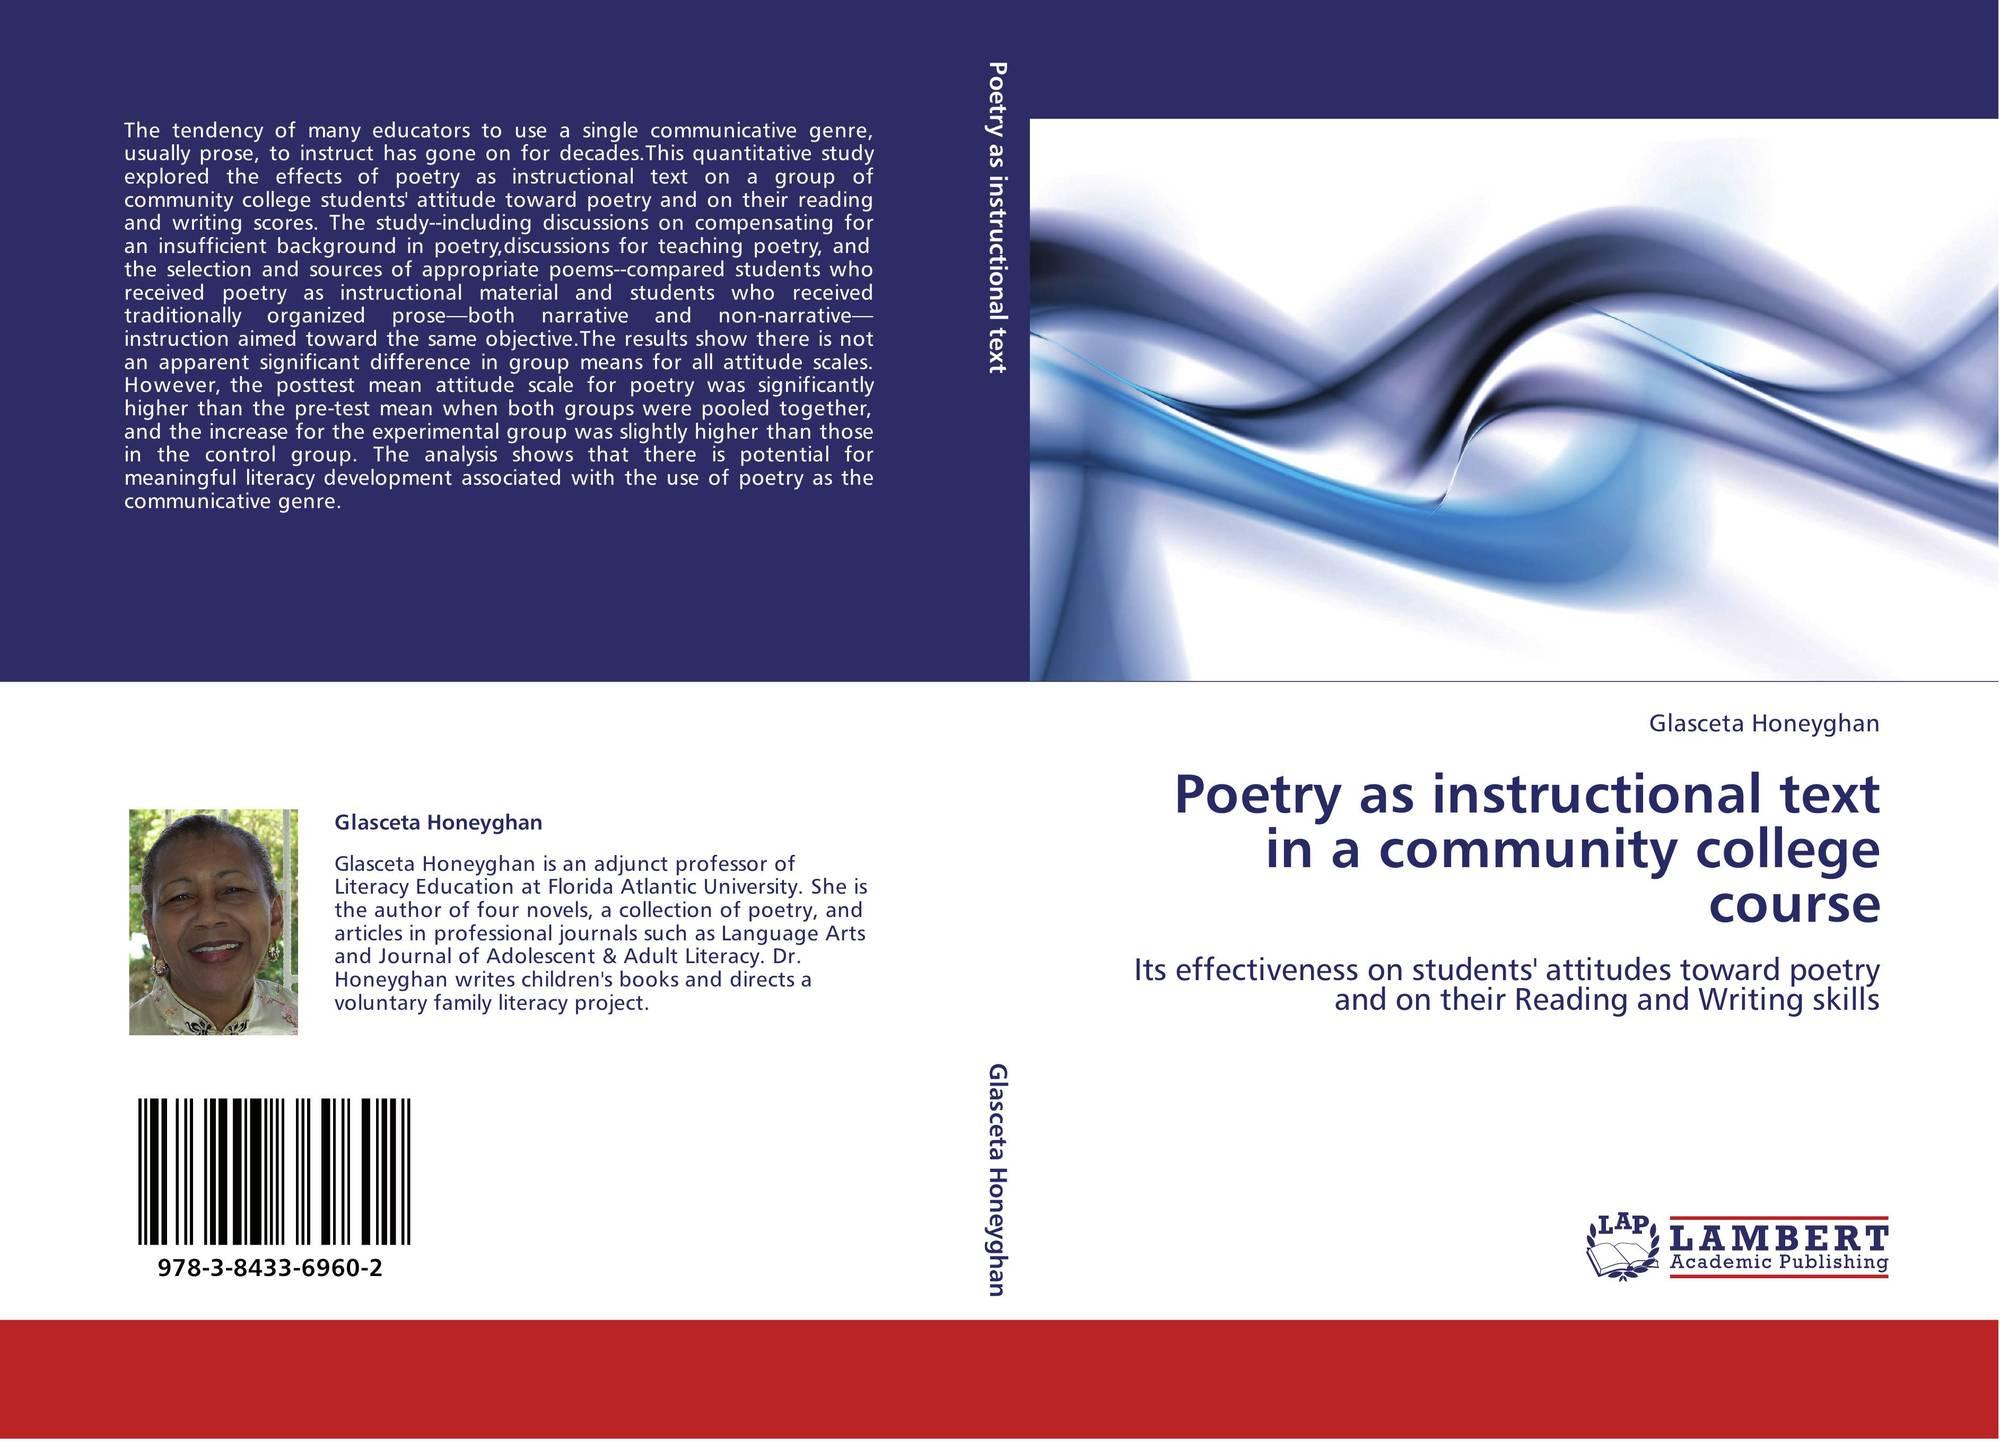 modernist poetry effectiveness